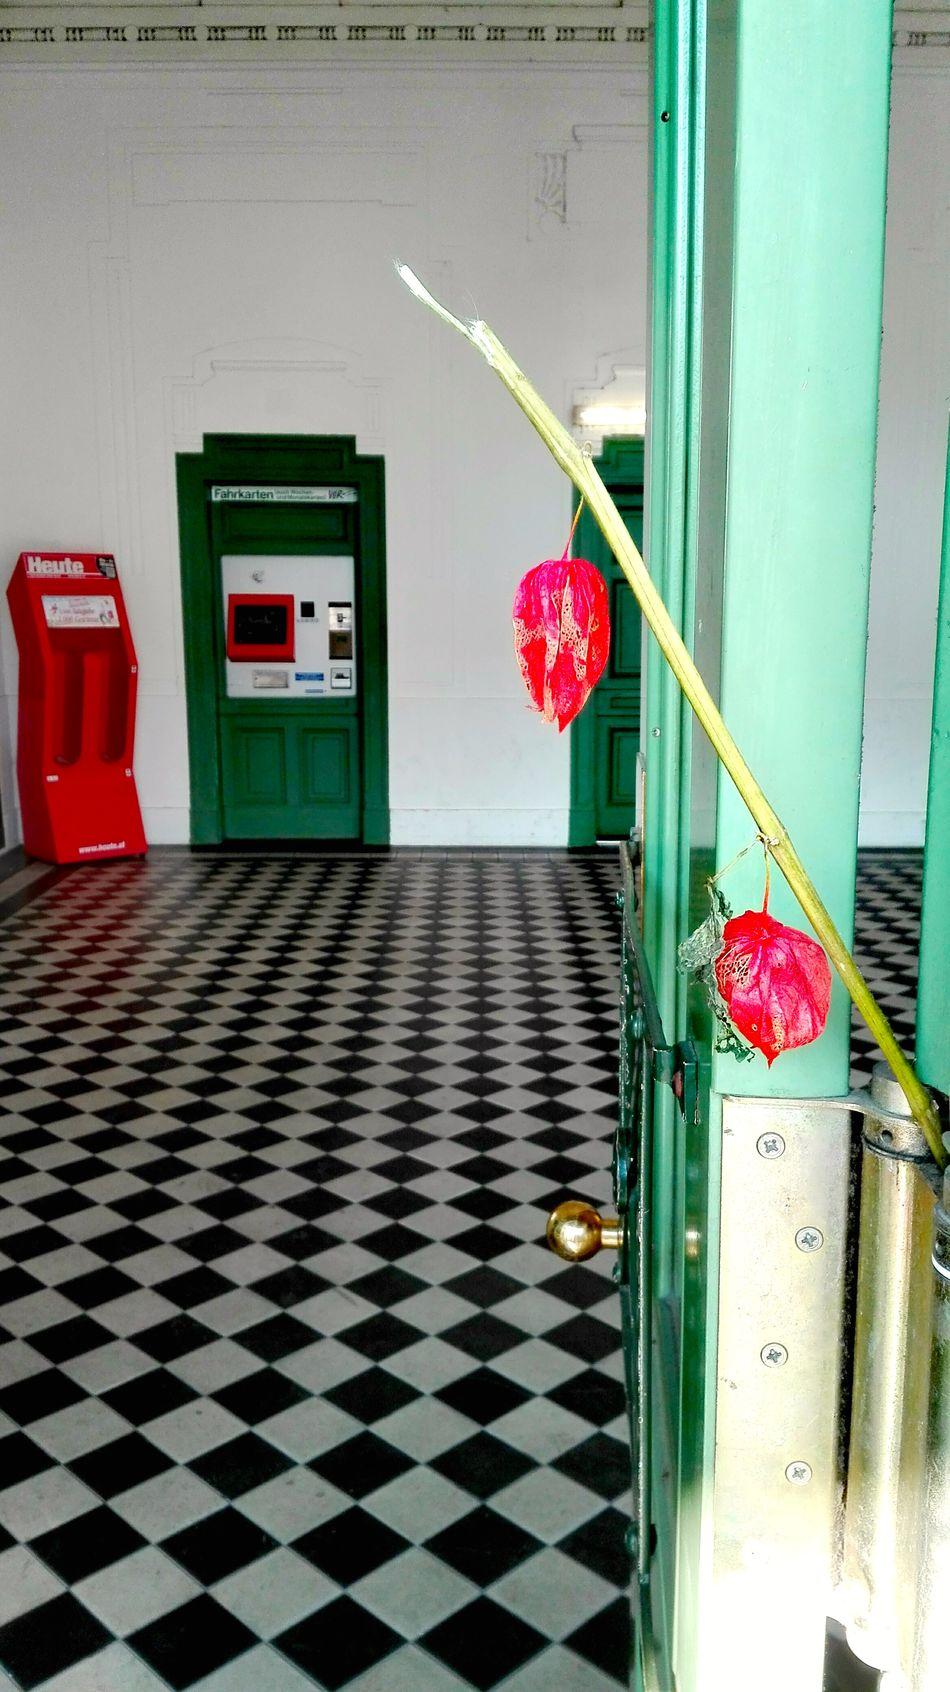 """Flowers from a Stranger"" Blume Decoration Flower Flowers From A Stranger Green Color Houseplant Pink Color Red Symbol Ubahn Ubahn Wien UbahnStation Underground Station"